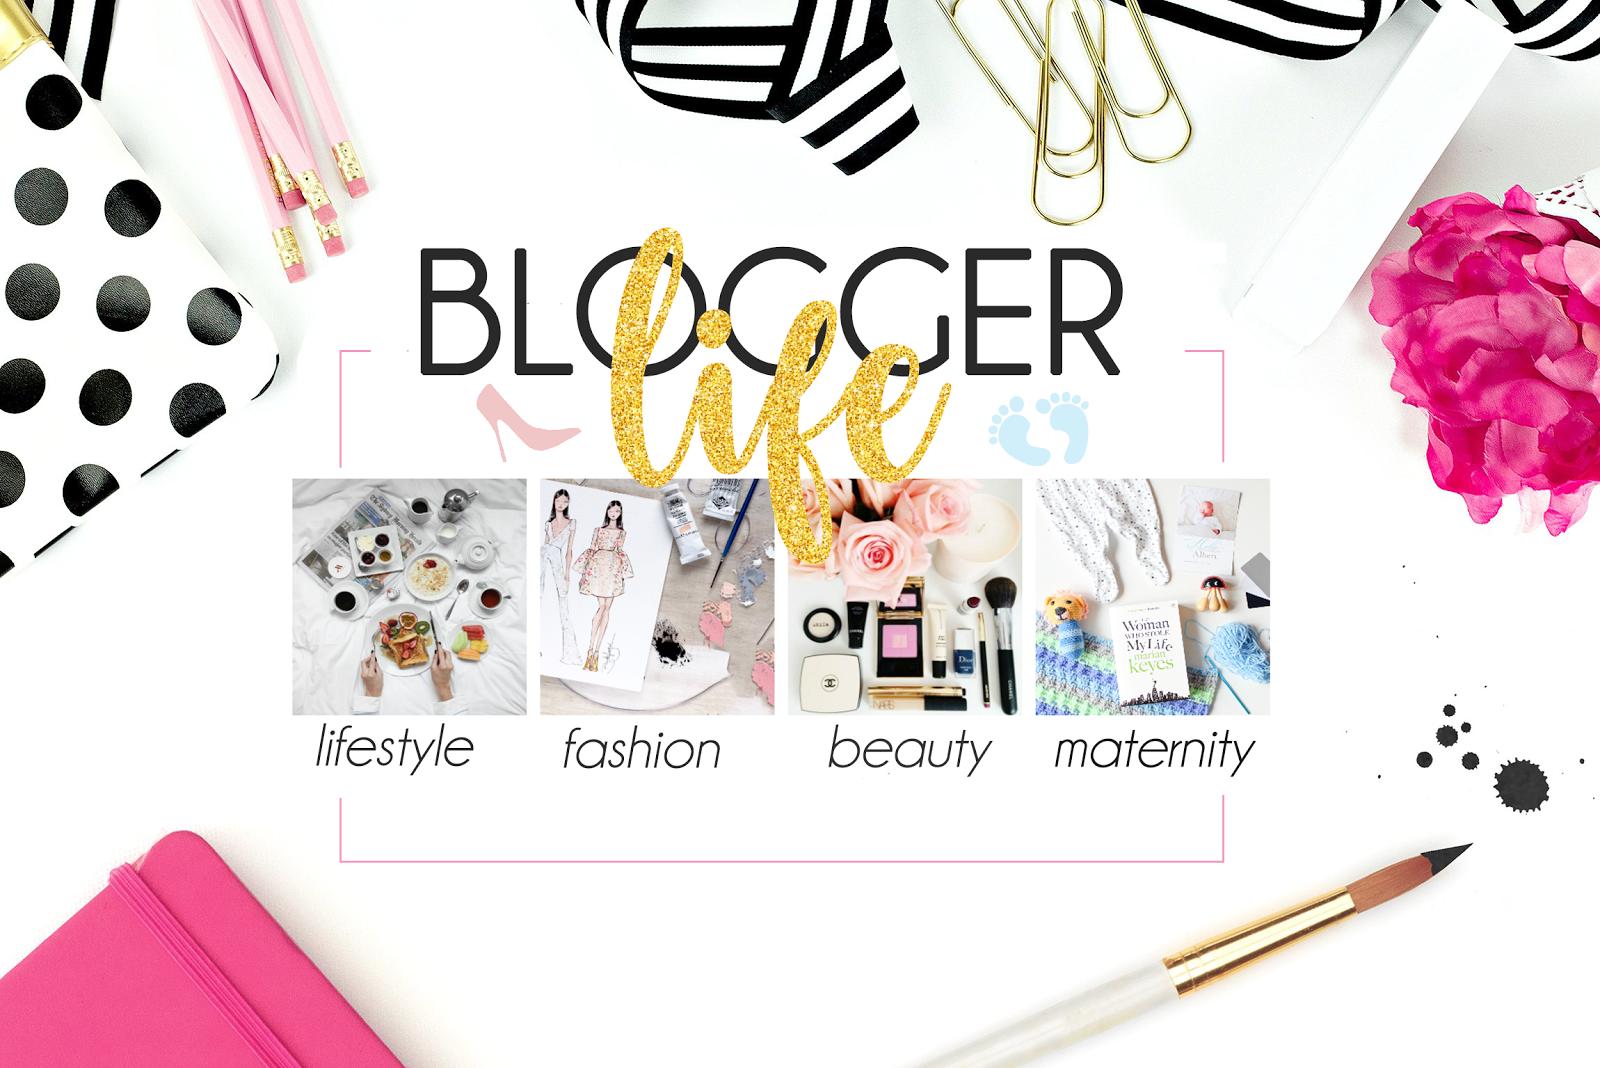 Grožio Blogas/ Beauty Blog